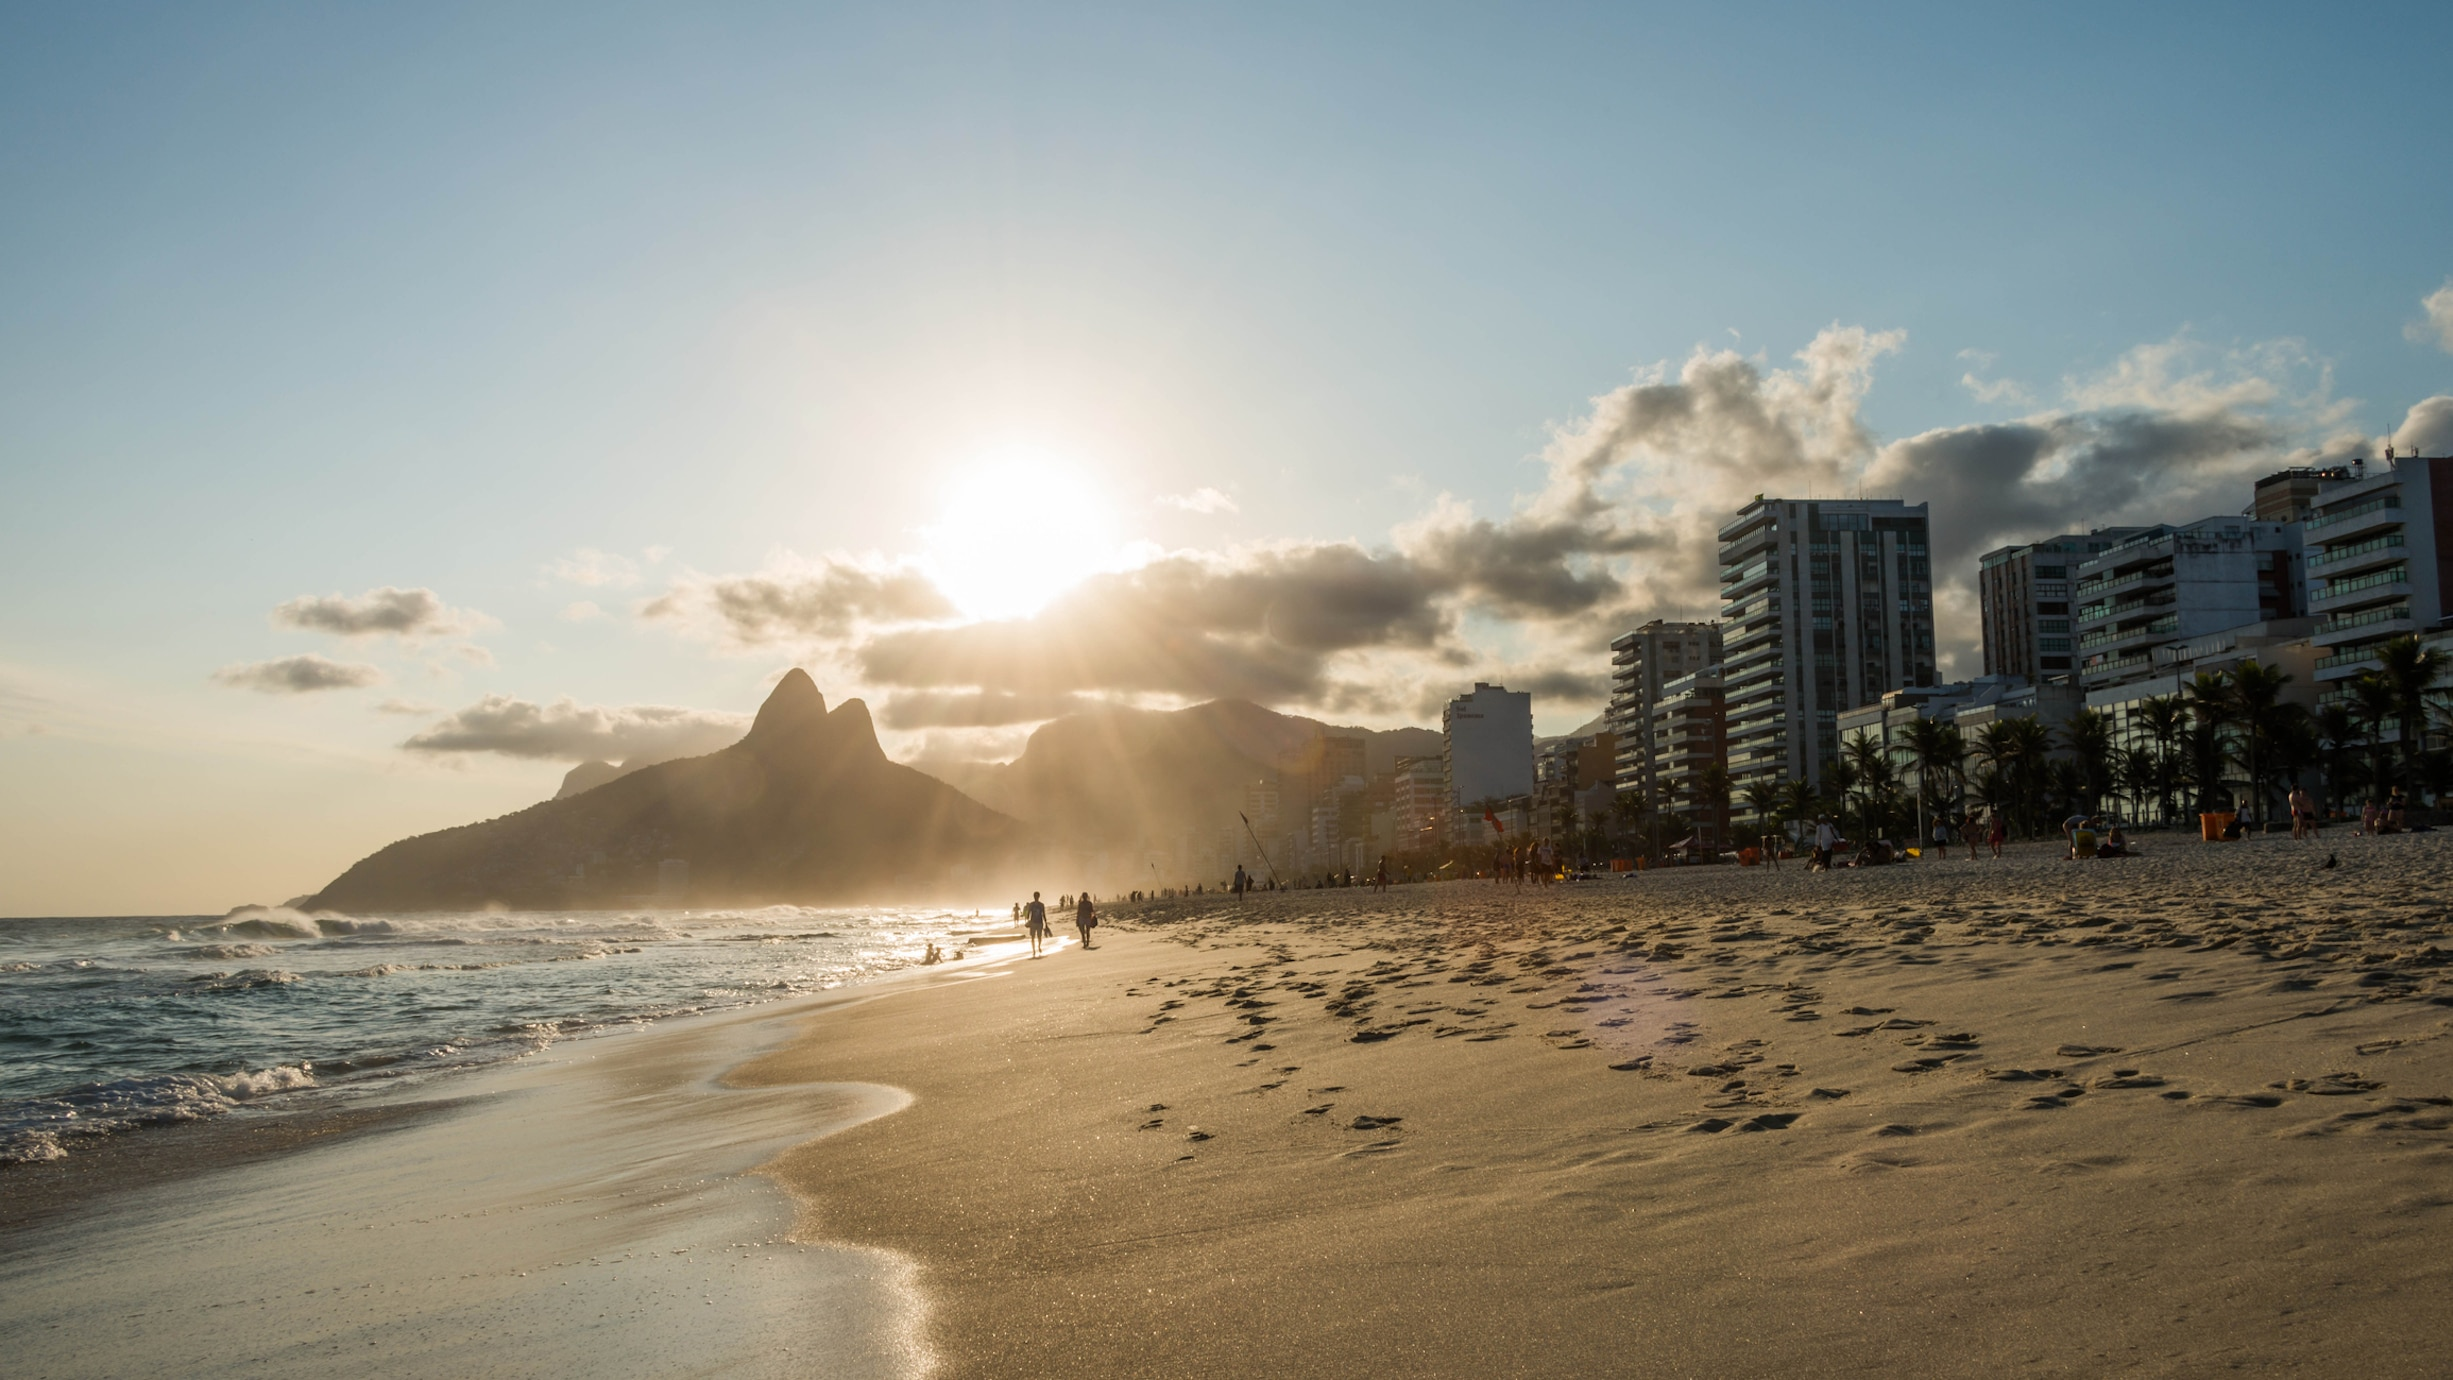 Sonnenuntergang am Ipanema Strand in Rio de Janeiro, Brasilien